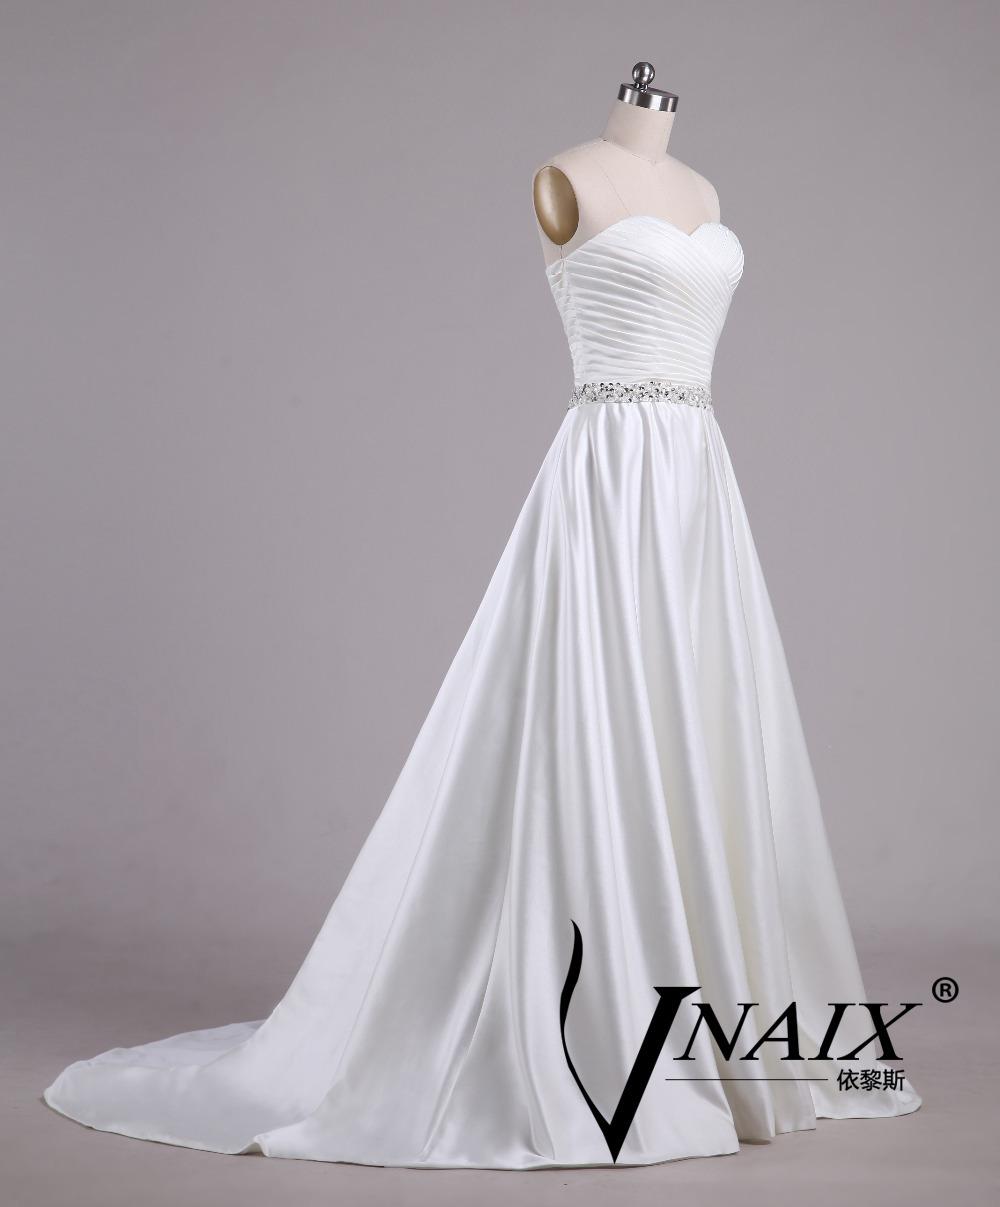 Simple And Elegant White Satin Sweetheart With Jacket: Aliexpress.com : Buy Vnaix WV609 Simple Elegant Sweetheart